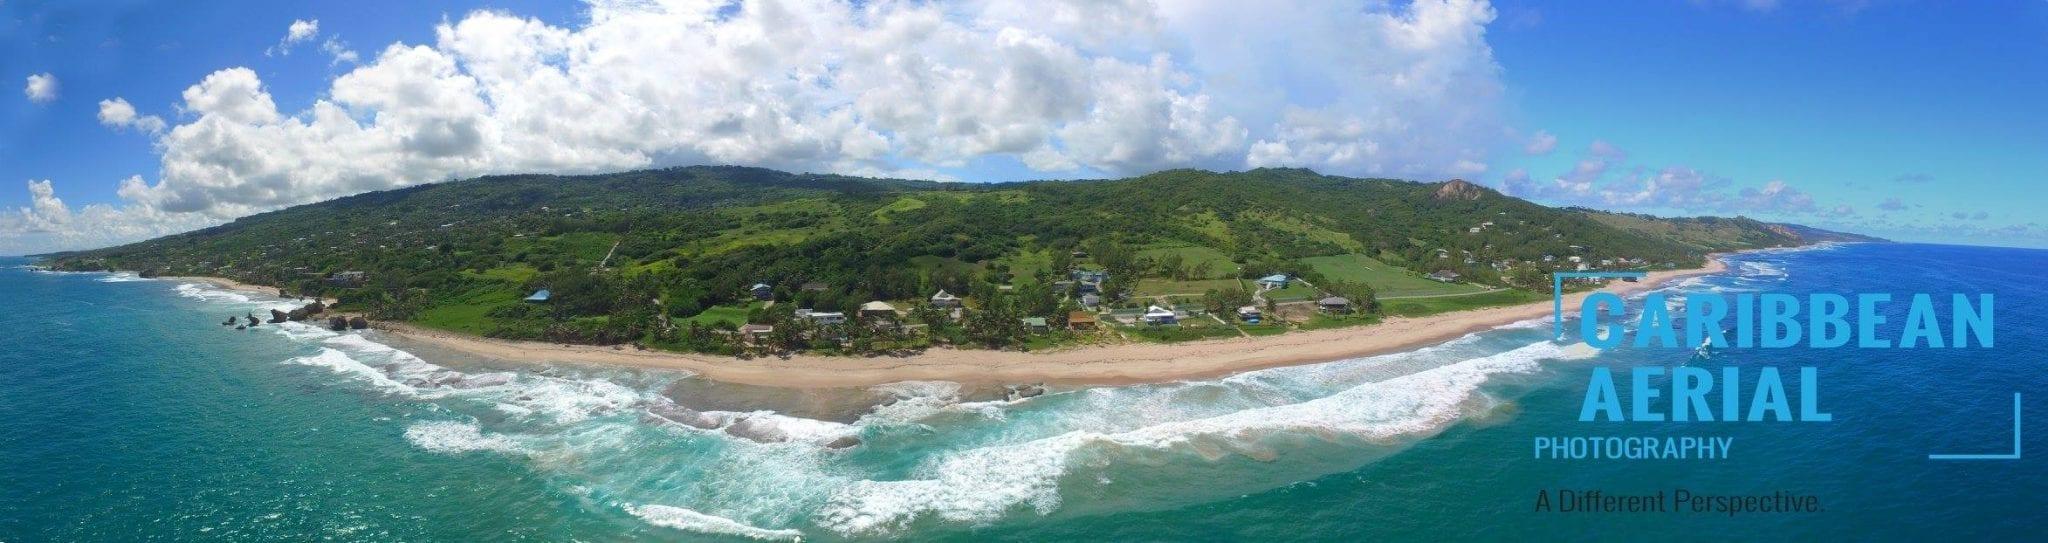 caribbean-aerial-photography-004